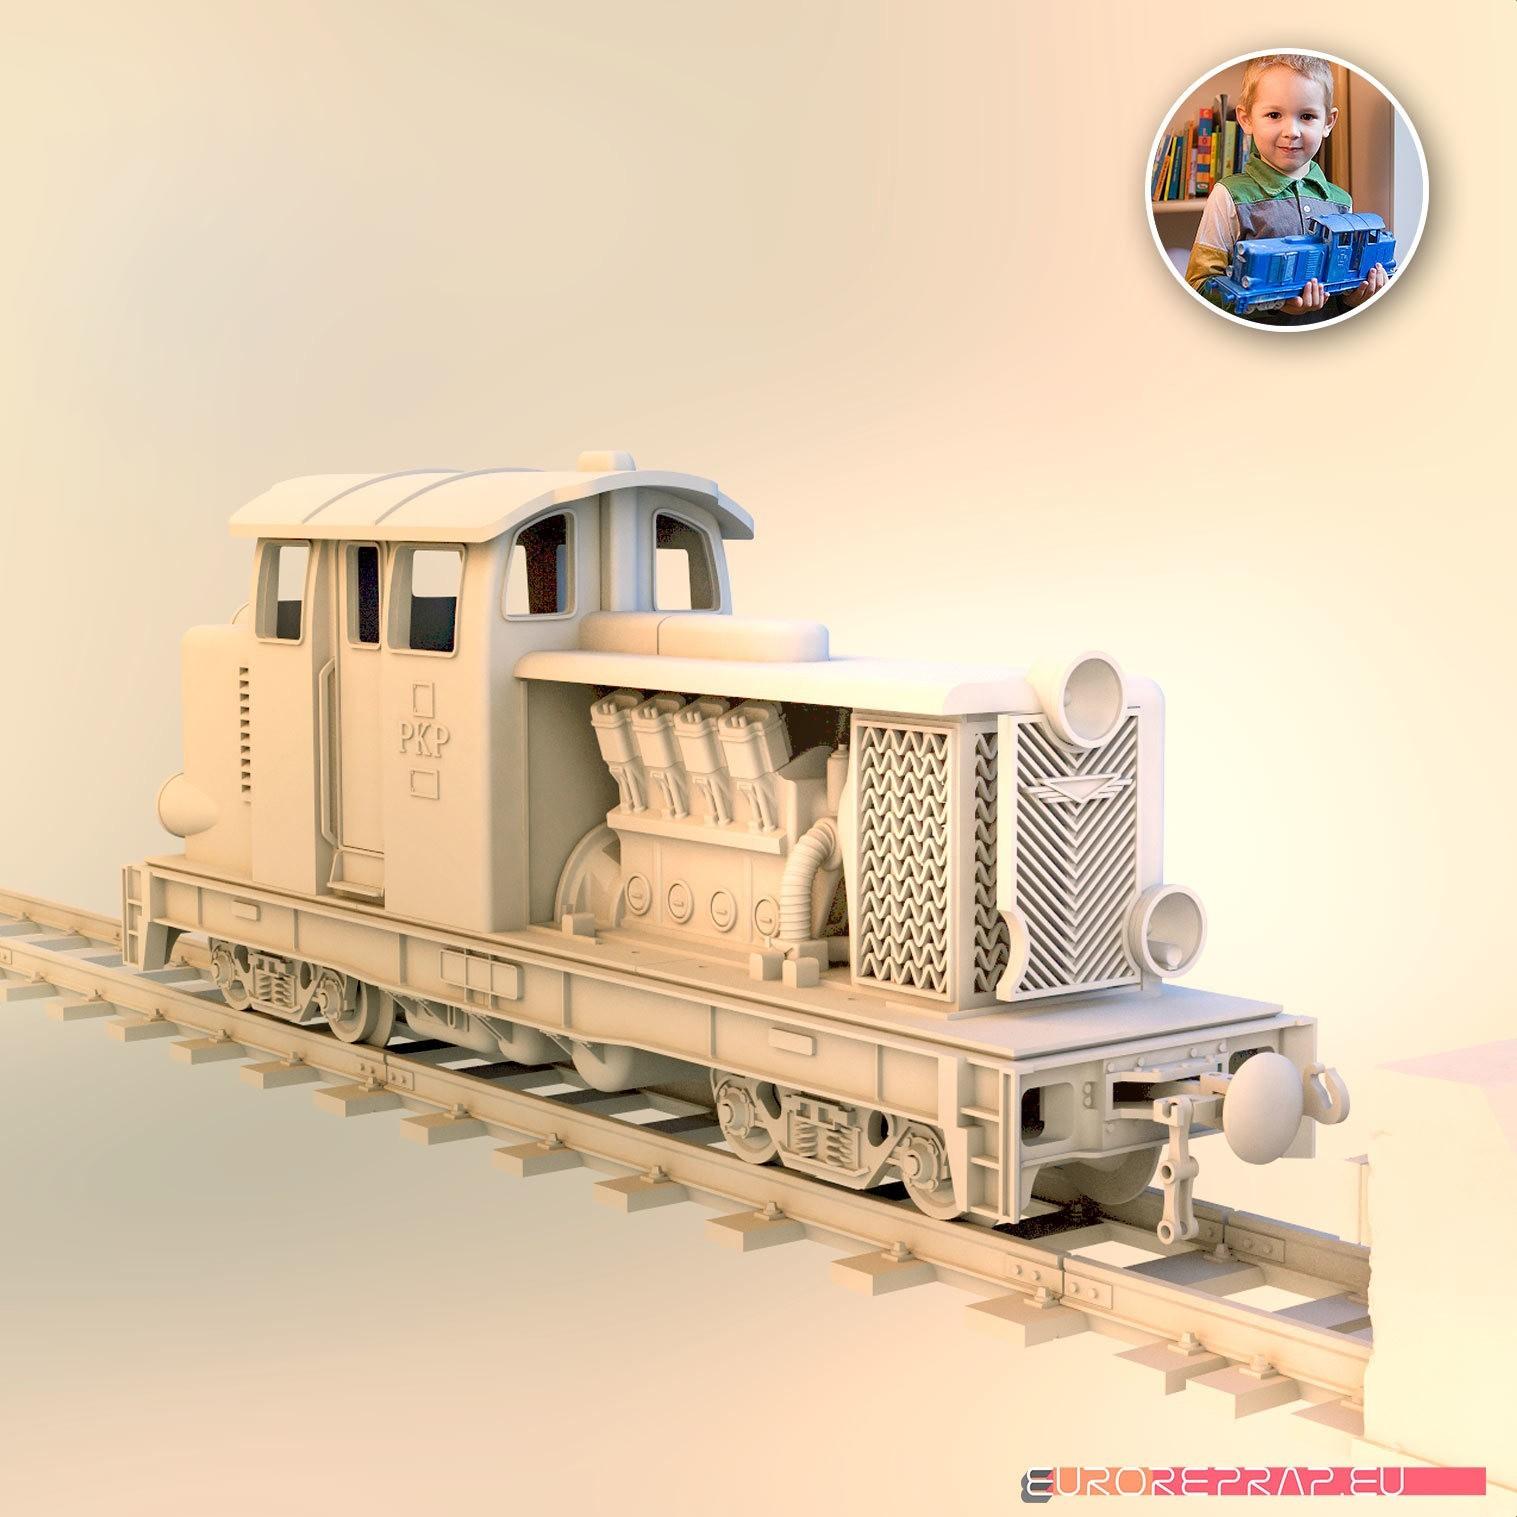 c01.jpg Download STL file Diesel-01-C locomotive - ERS and others compatibile, FDM 3D printable • 3D printer object, euroreprap_eu